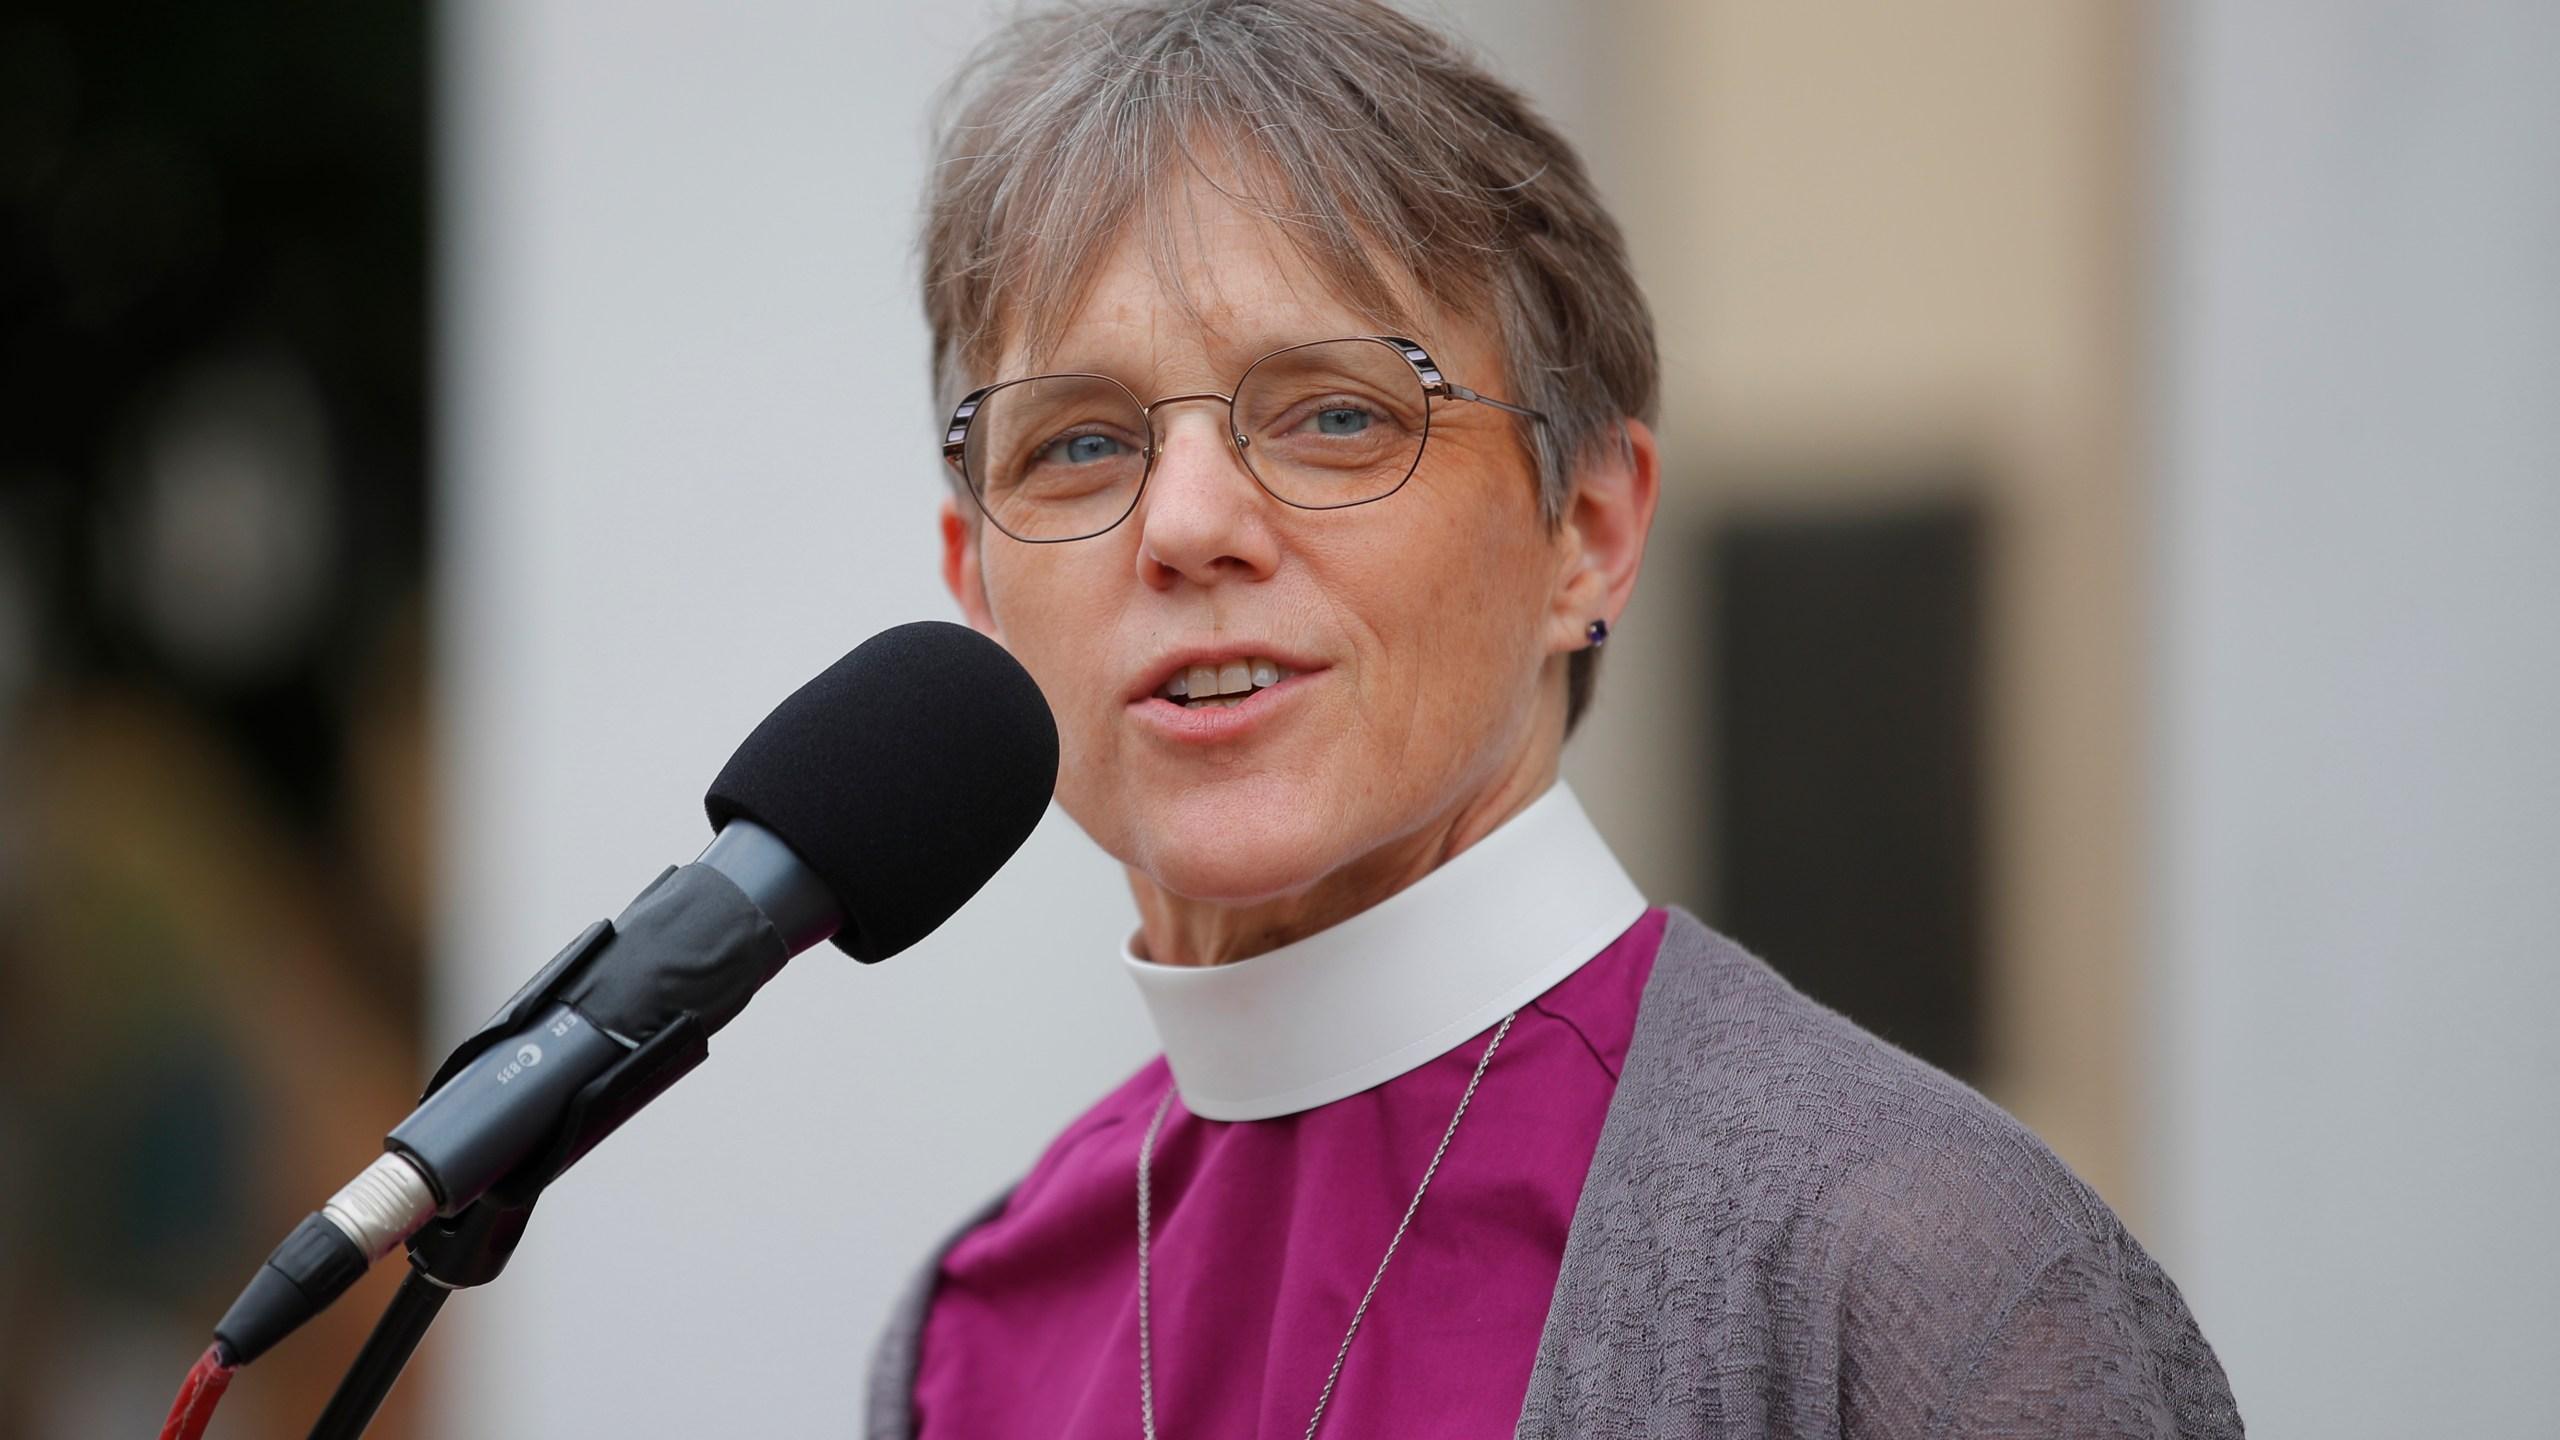 Bishop Mariann Edgar Budde